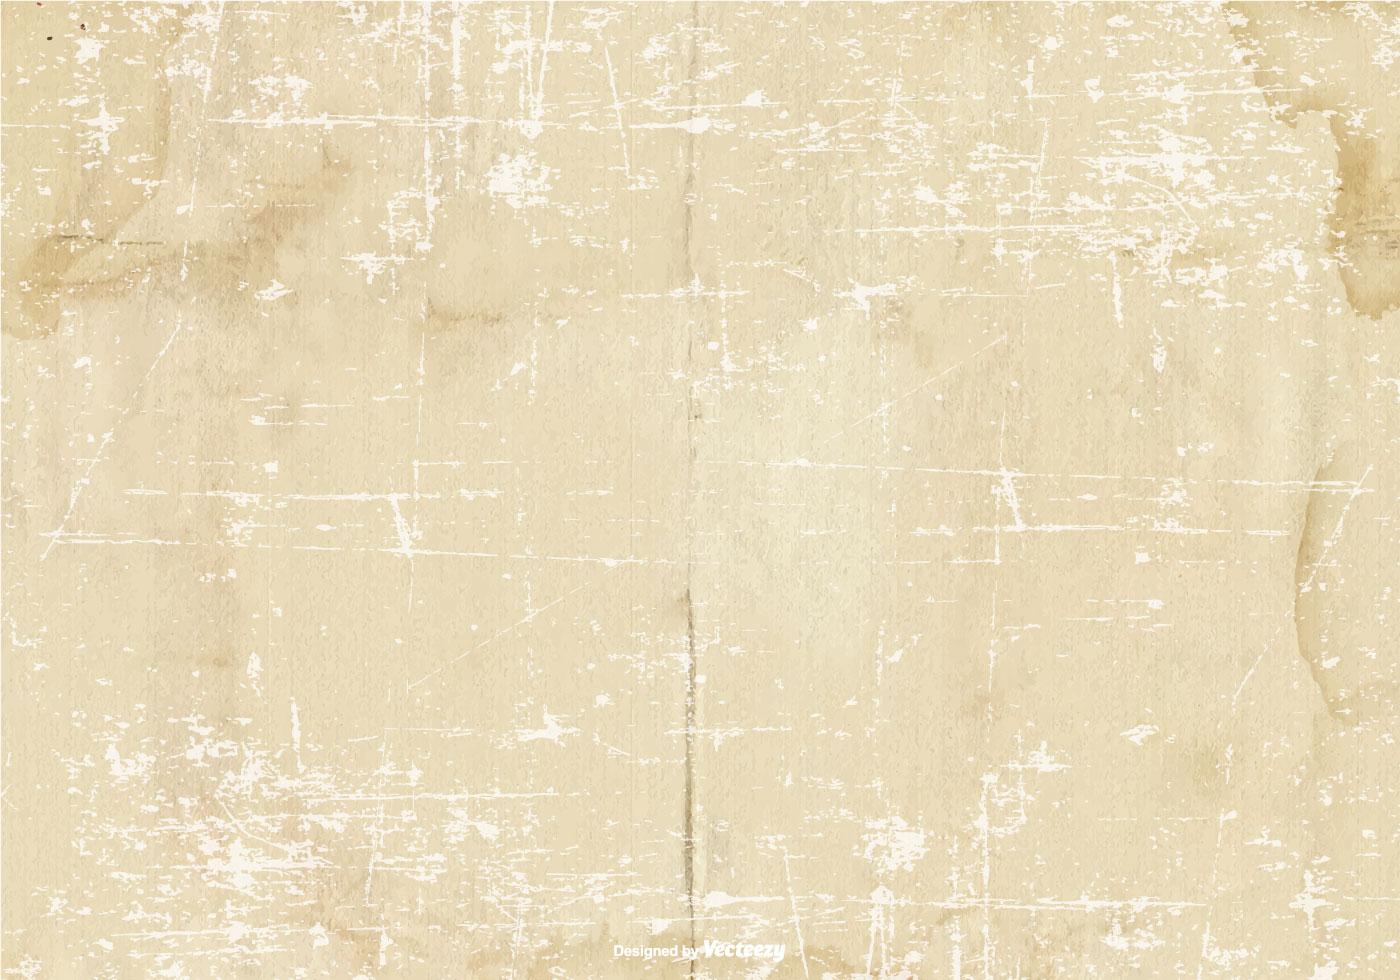 Old Grunge Vintage Paper Texture - Download Free Vectors ...